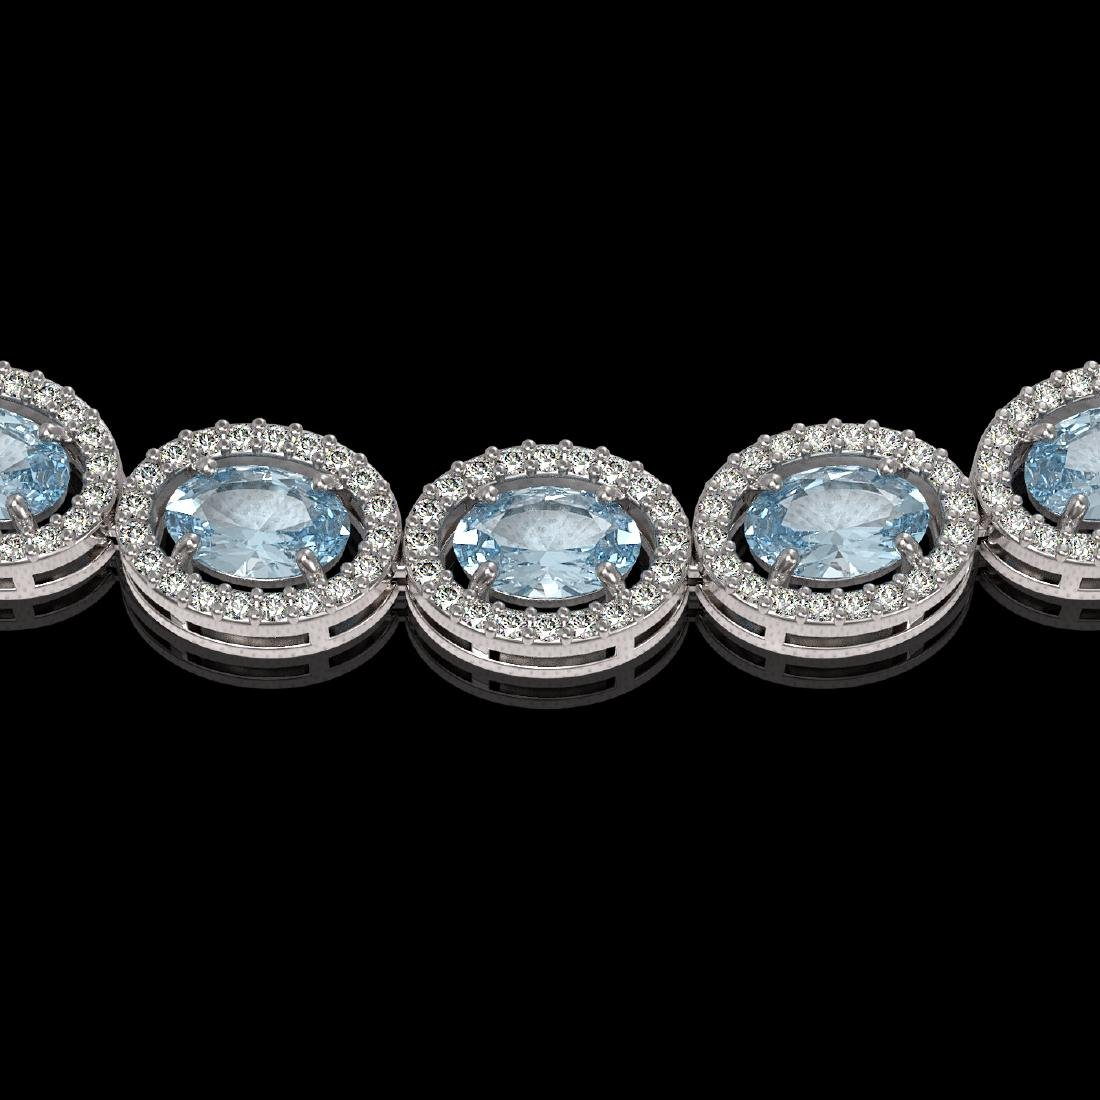 24.65 CTW Aquamarine & Diamond Halo Necklace 10K White - 3